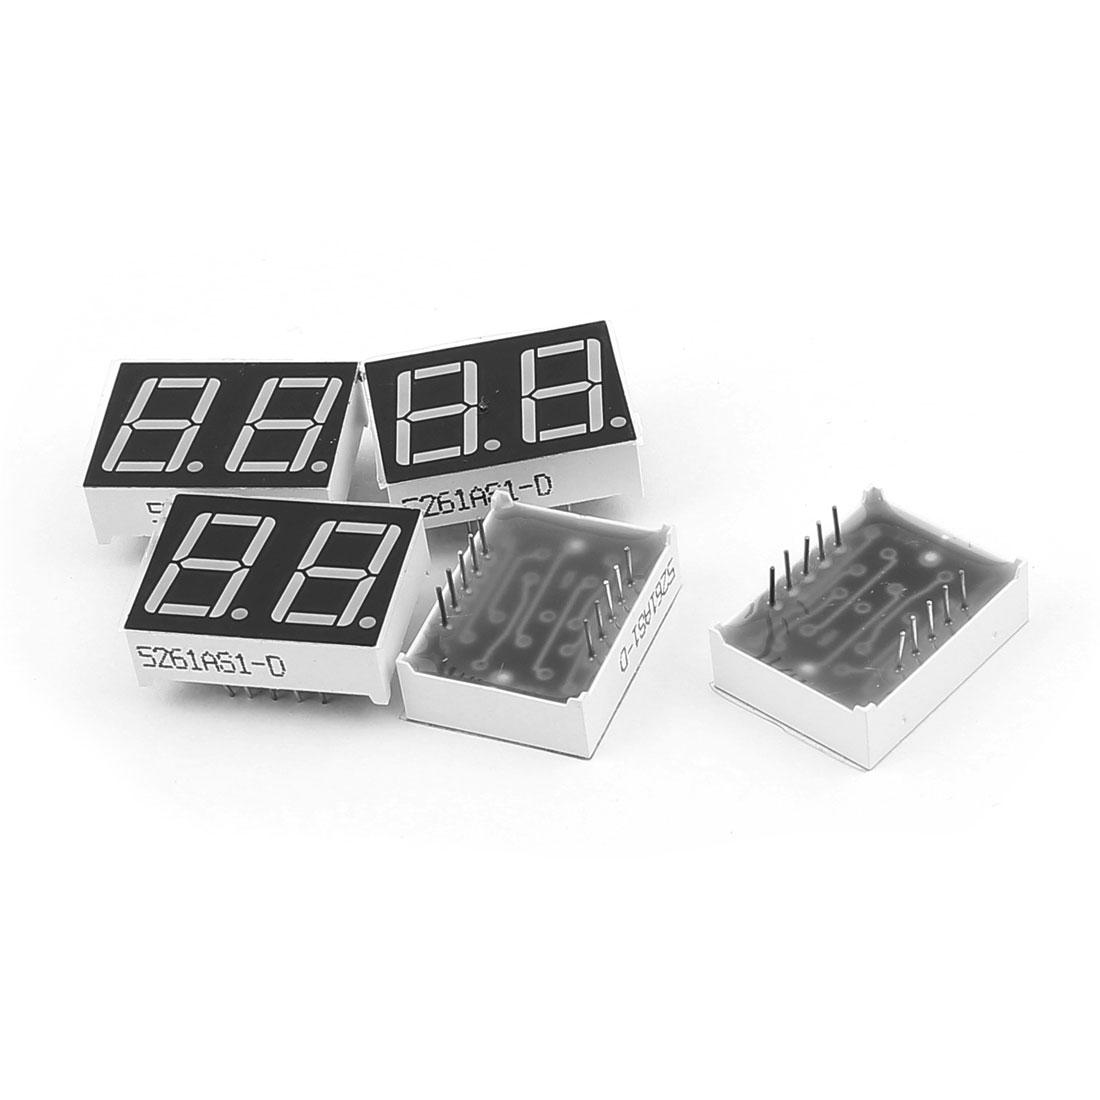 "5 Pcs Common Cathode 10 Pin 2 Bit 7 Segment 0.56"" Red LED Display Digital Tube"